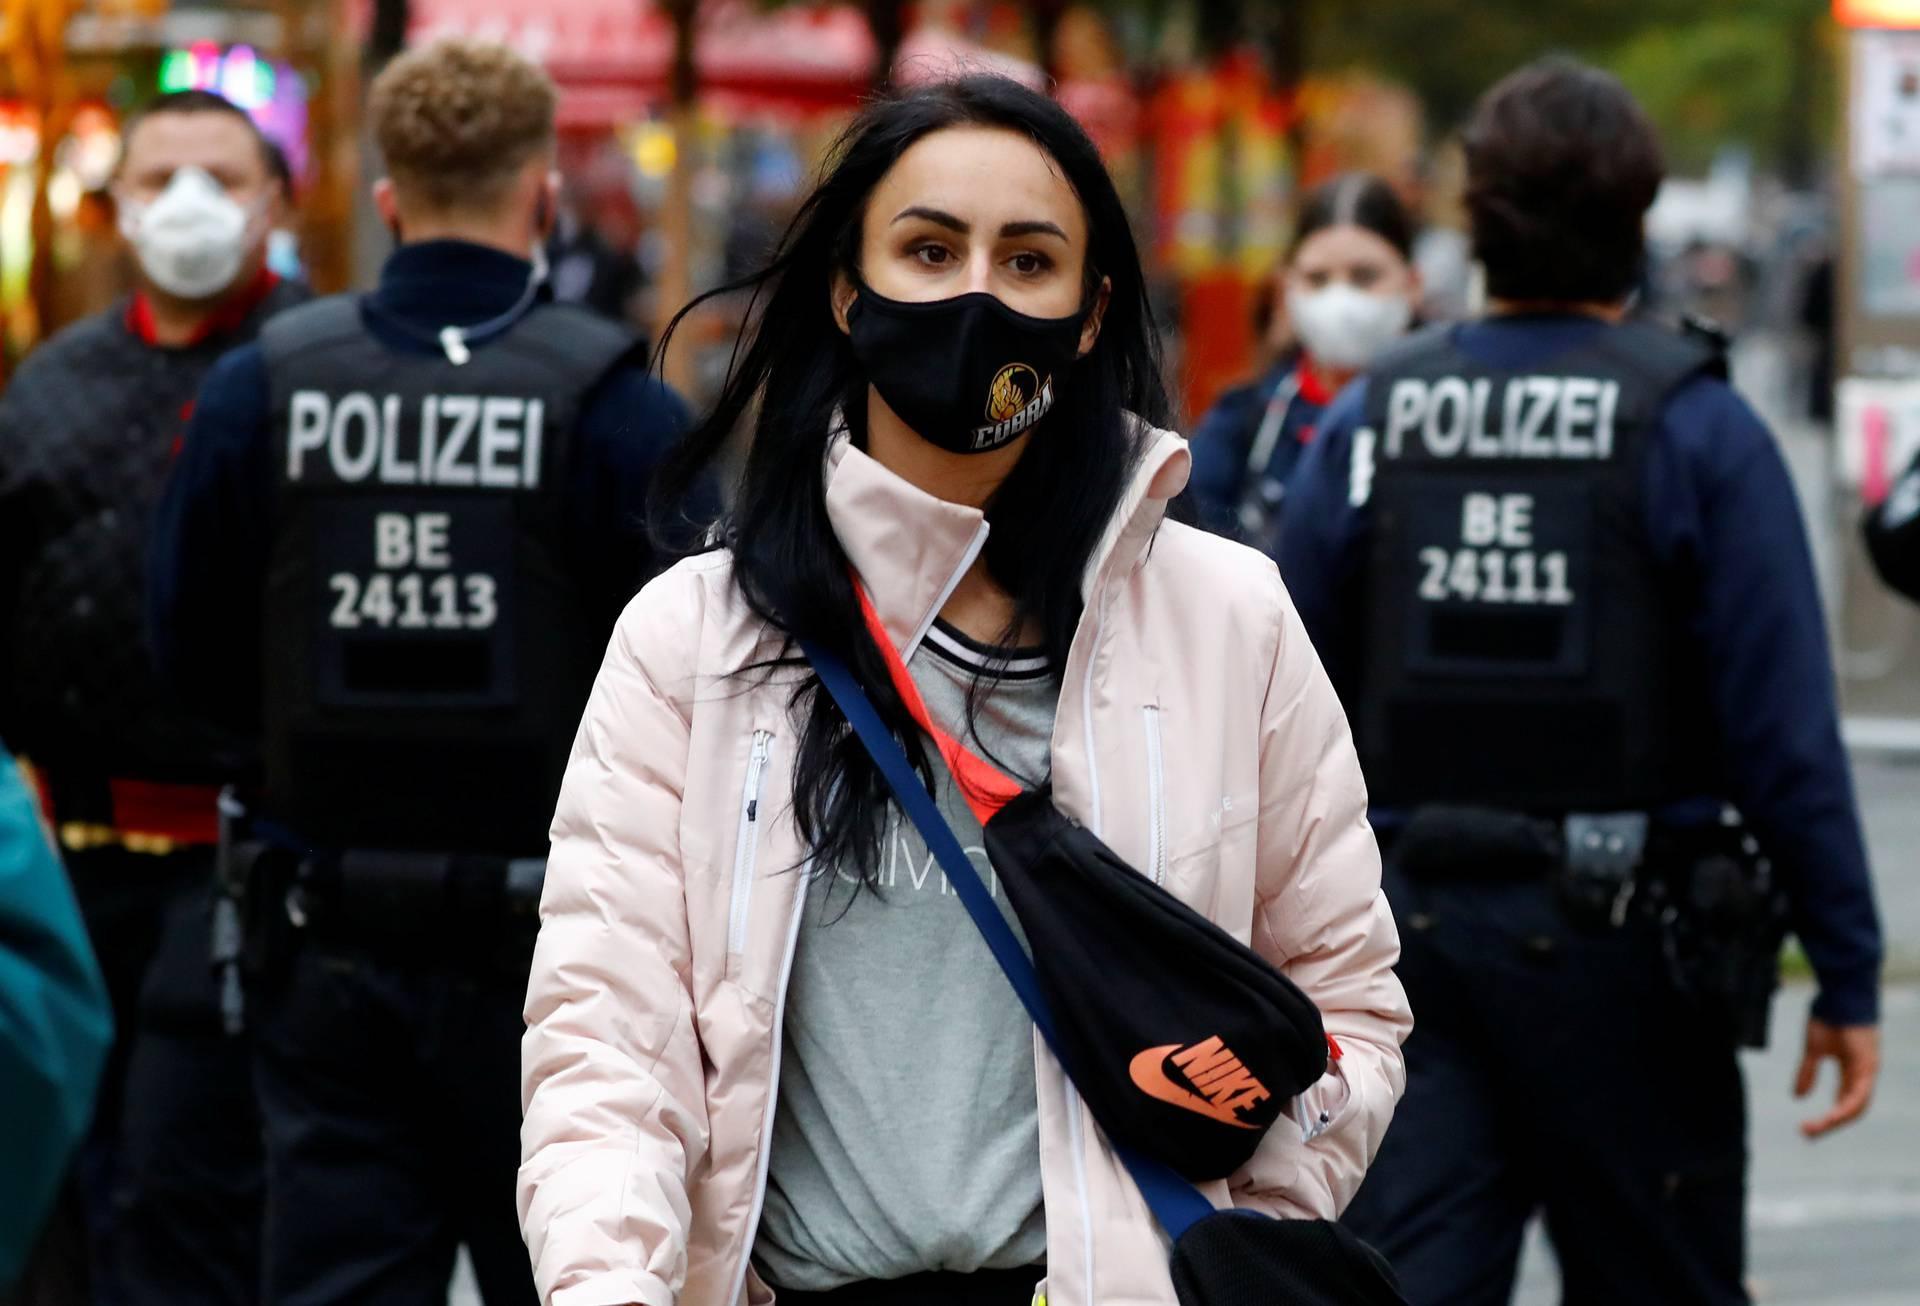 The outbreak of the coronavirus disease (COVID-19) in Berlin